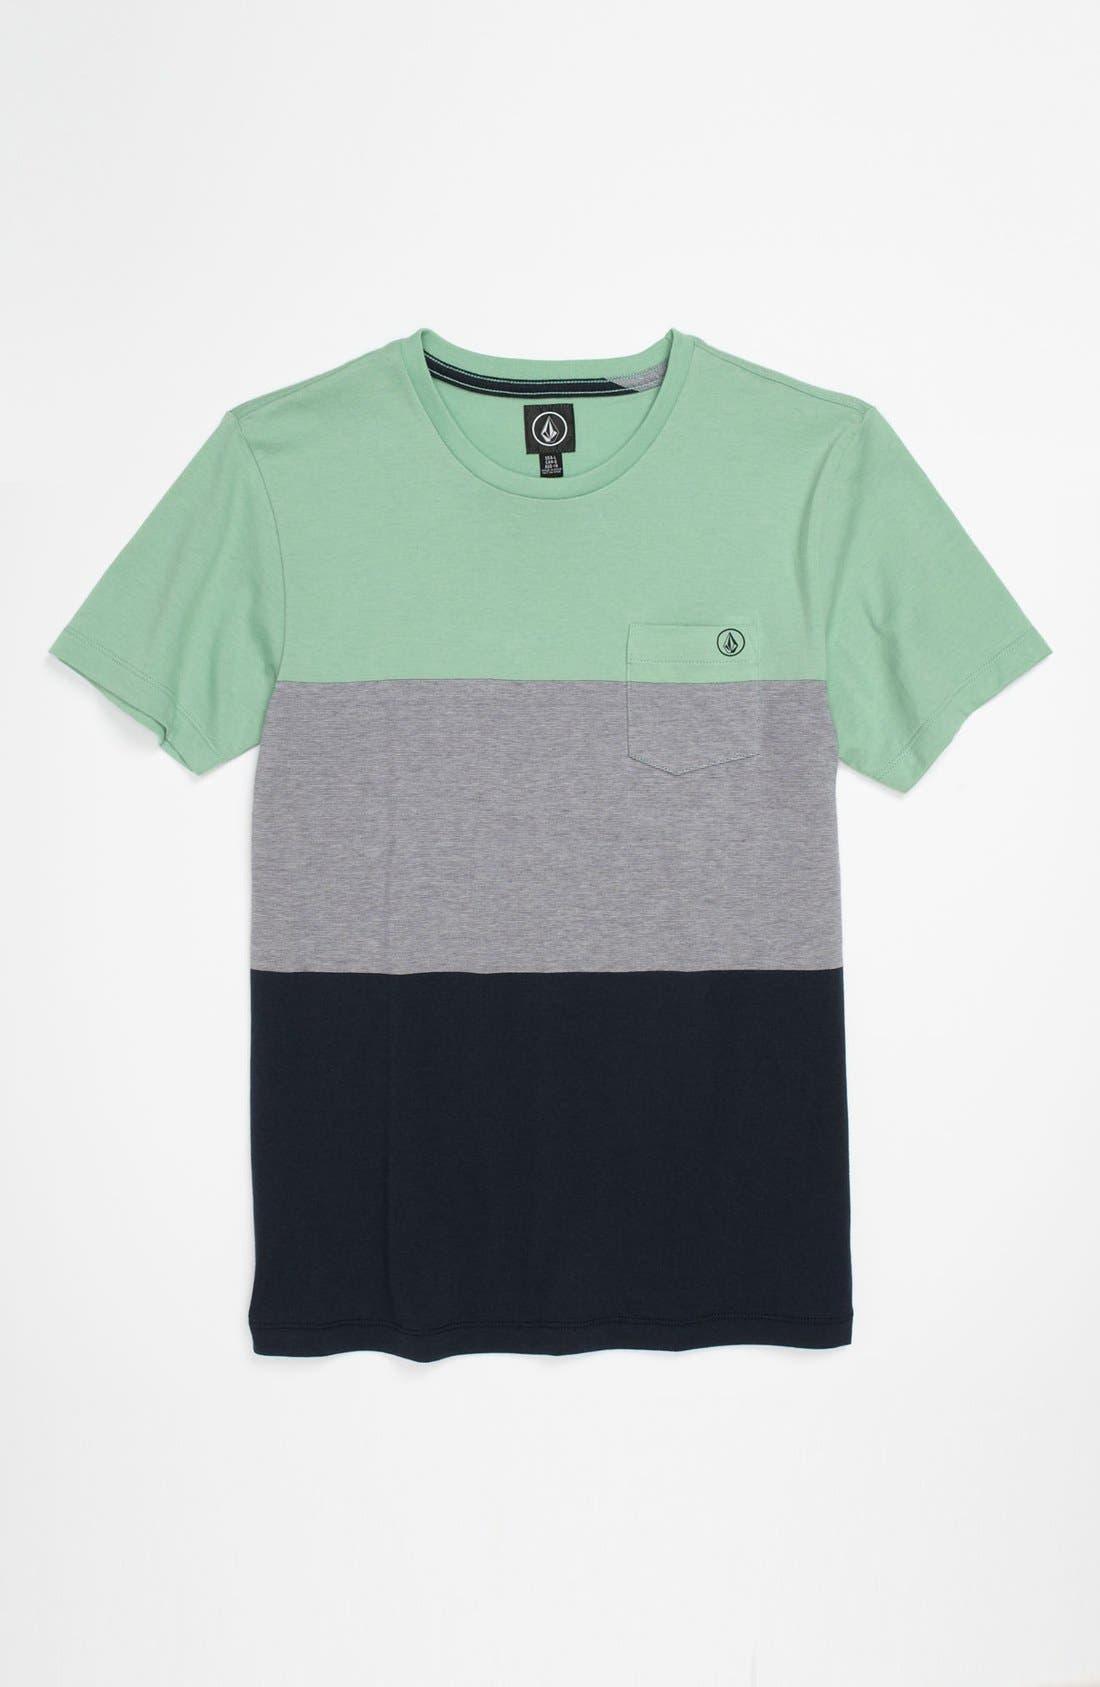 Main Image - Volcom 'Blakely' T-Shirt (Big Boys)